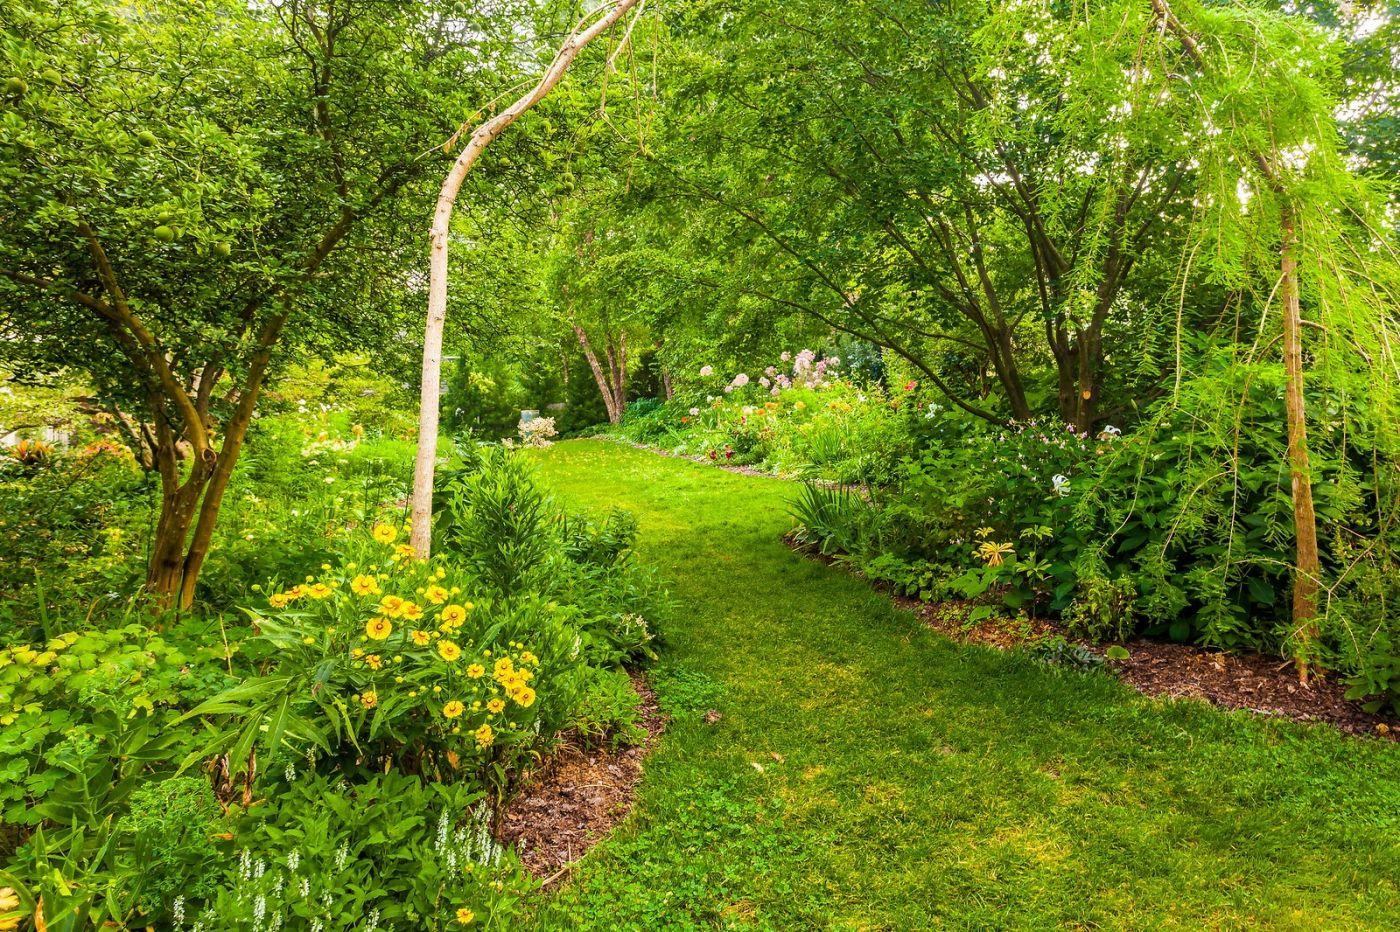 Chanticleer花园,融入自然_图1-7